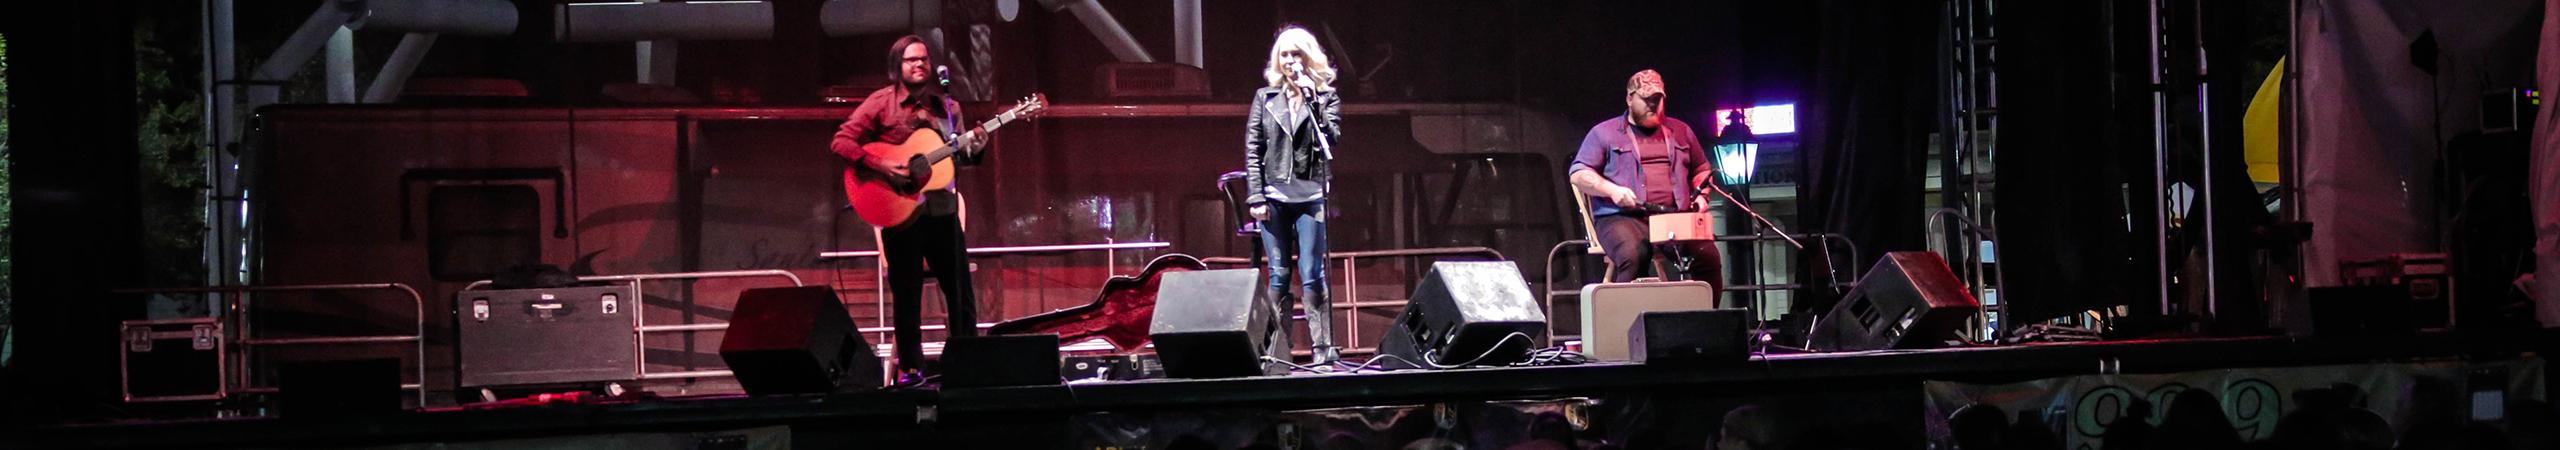 RaeLynn Concert at the Greater Jacksonville Fair